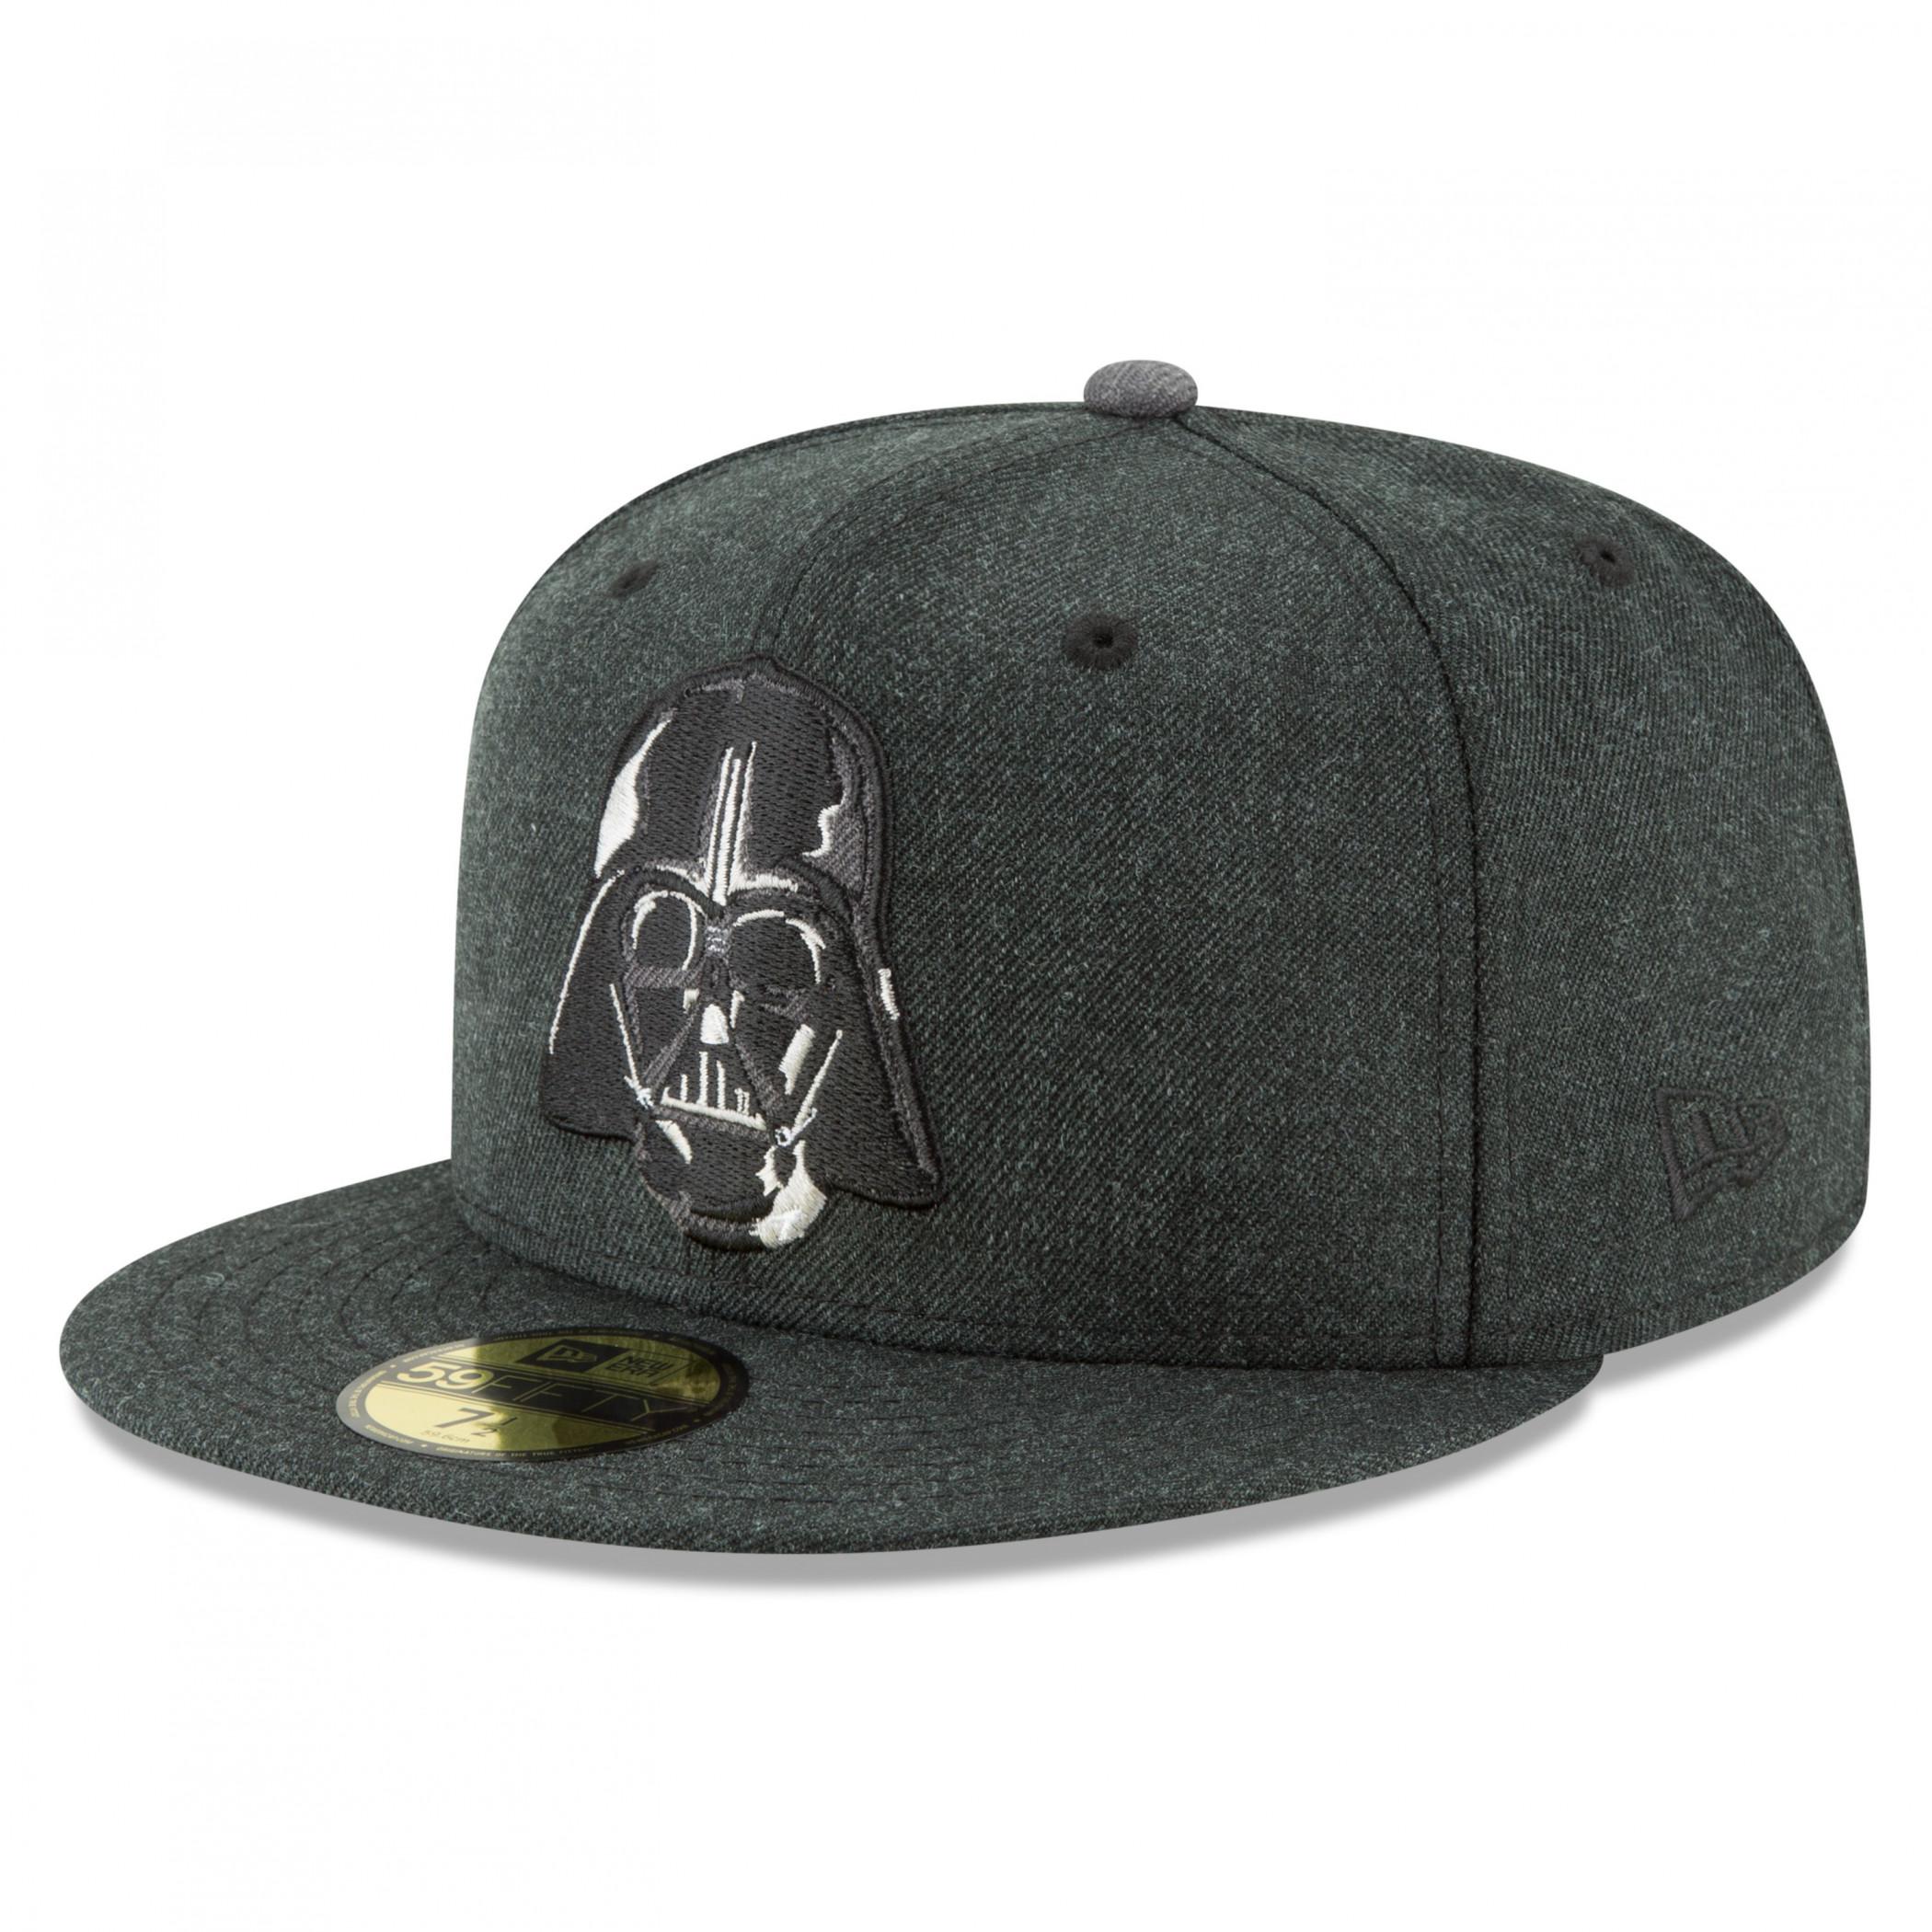 Star Wars Darth Vader Helmet New Era 59Fifty Fitted Hat